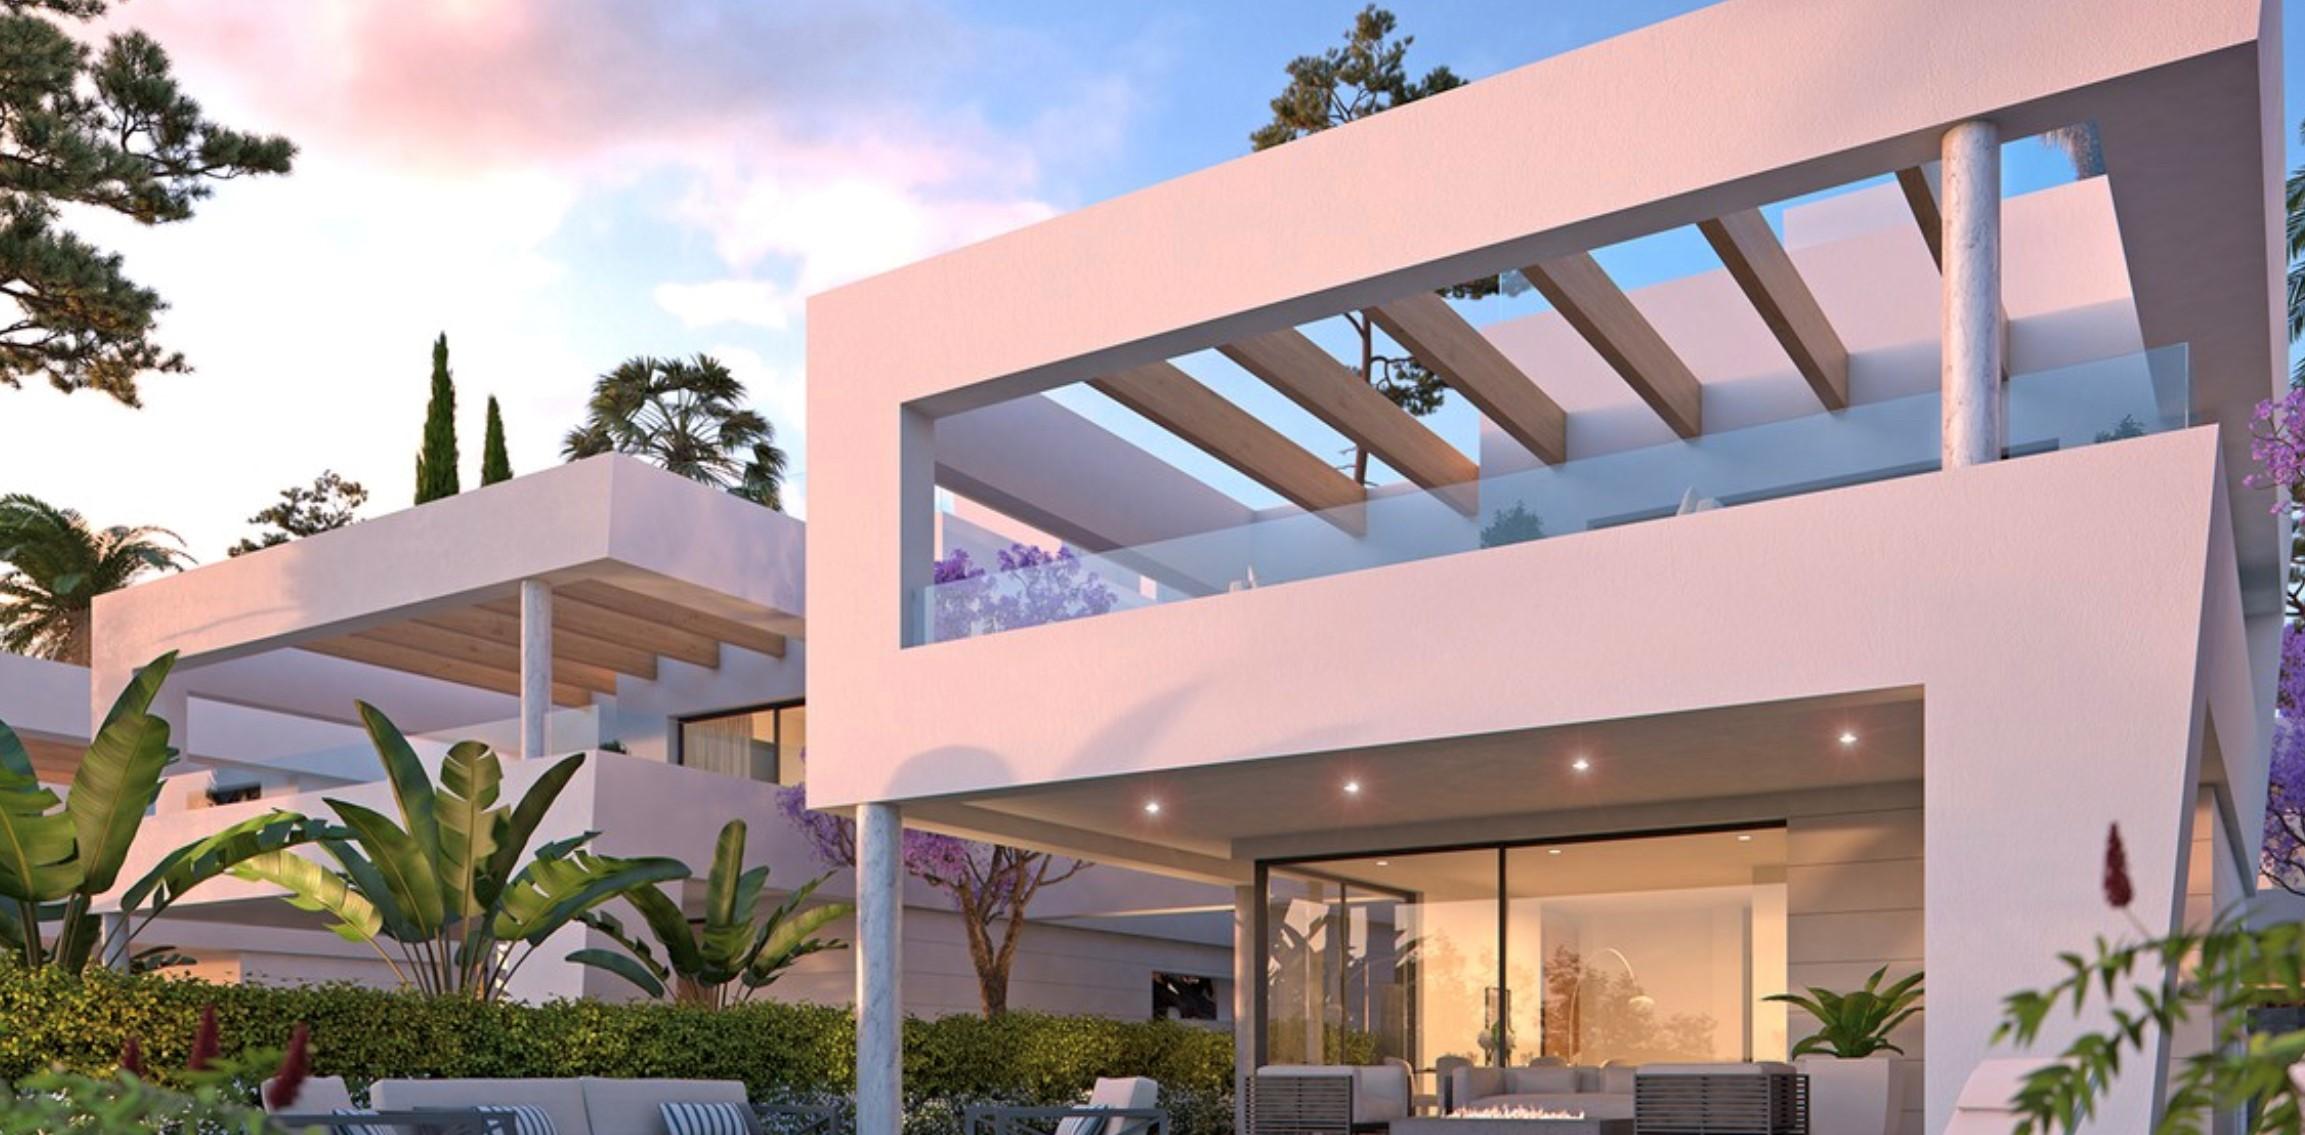 San Pedro de alc. villa €1.600.000